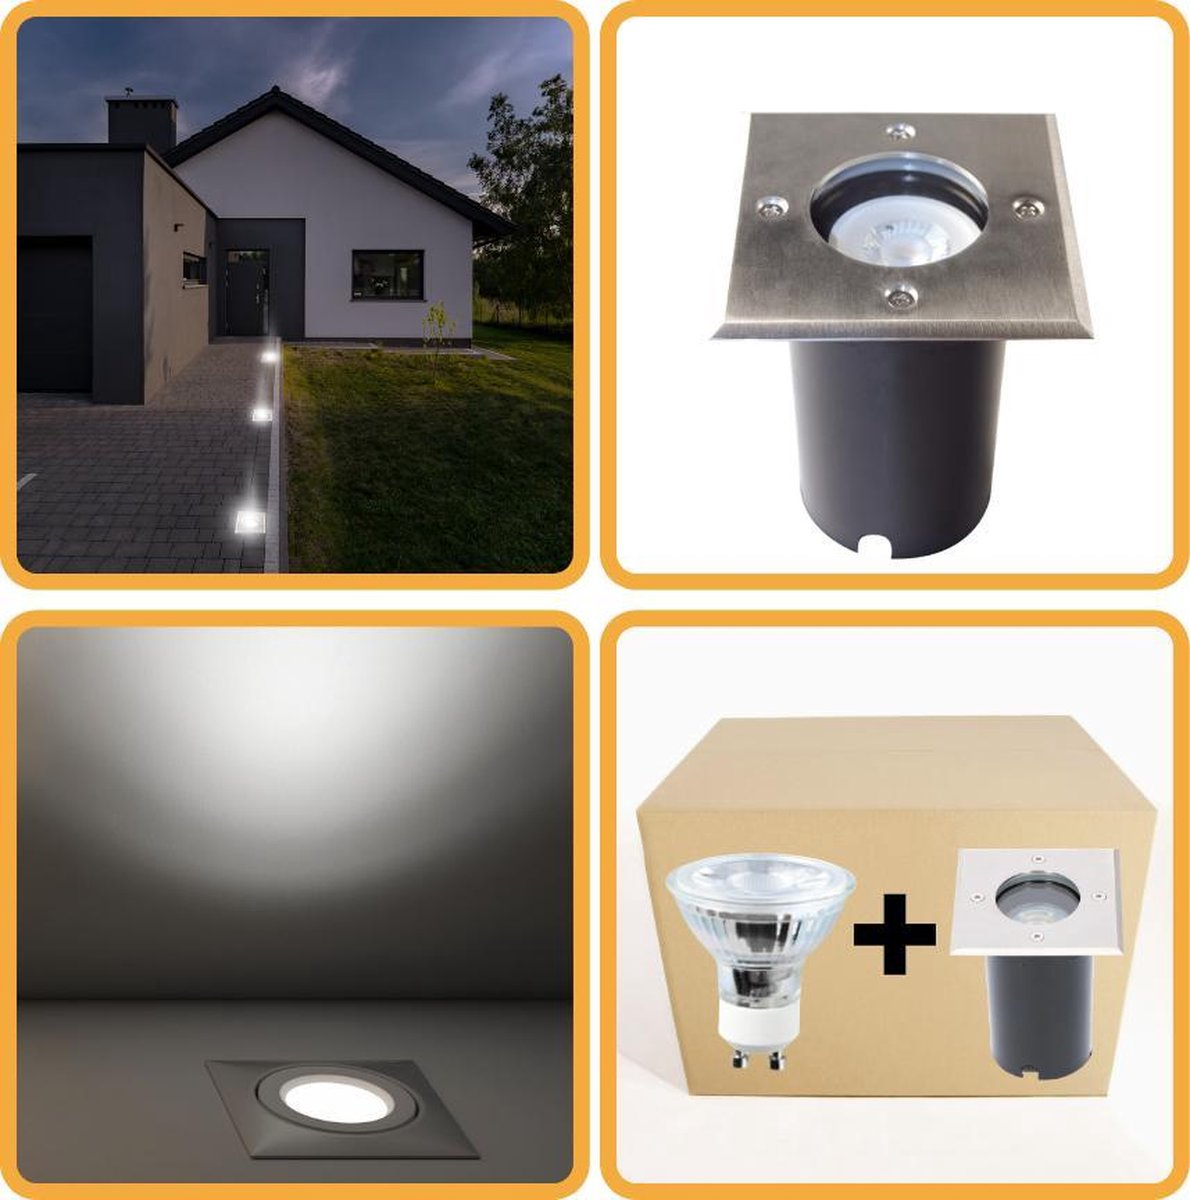 Proventa HeavyDuty LED Grondspot IP67 - Vierkant - inbouw tuinspot buiten - koud wit